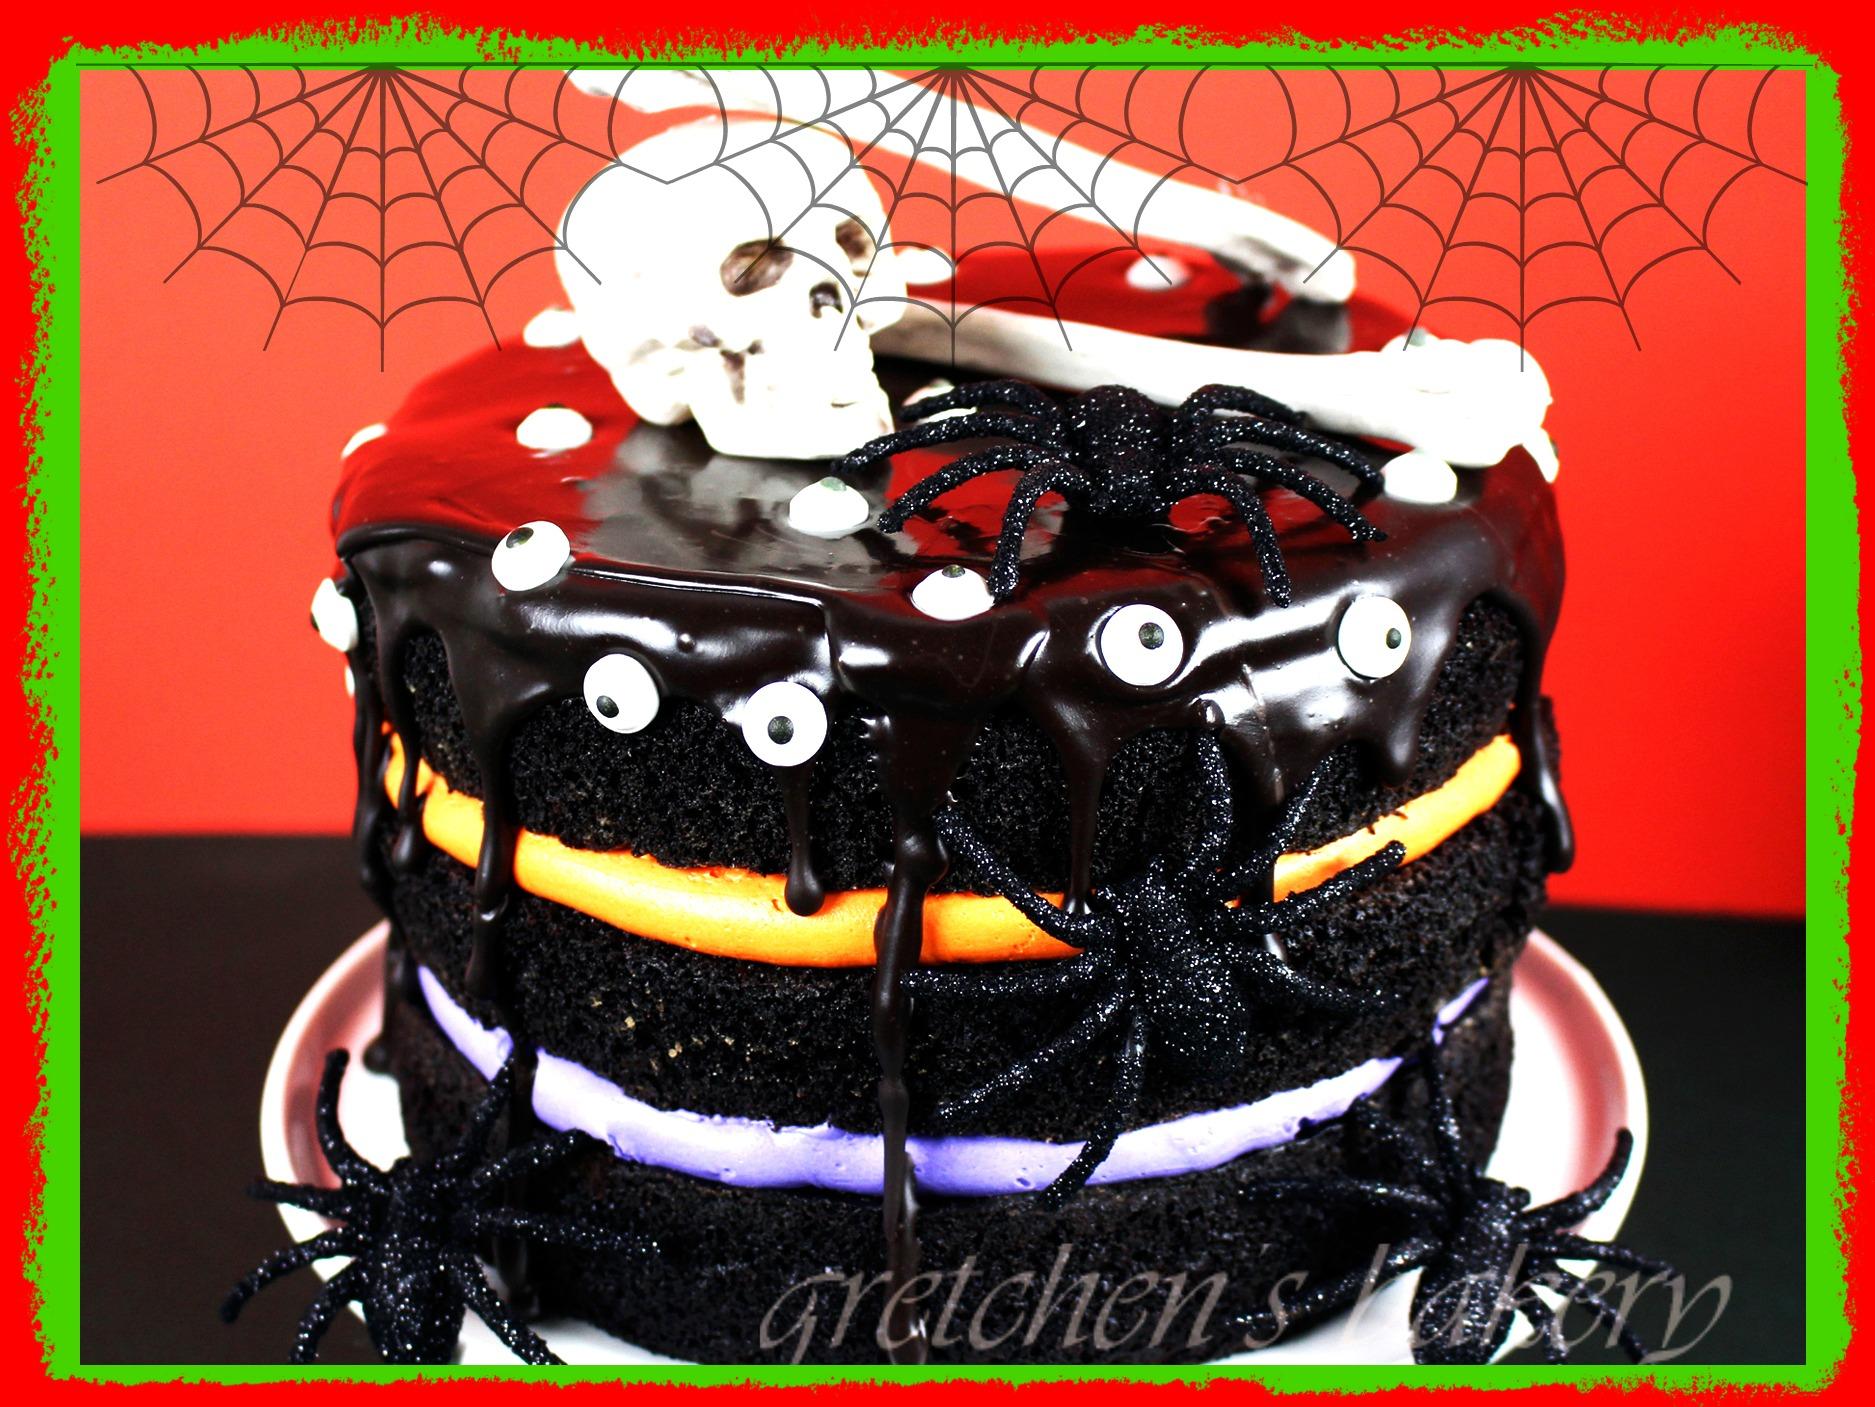 Vegan Black Chocolate Cake for halloween!